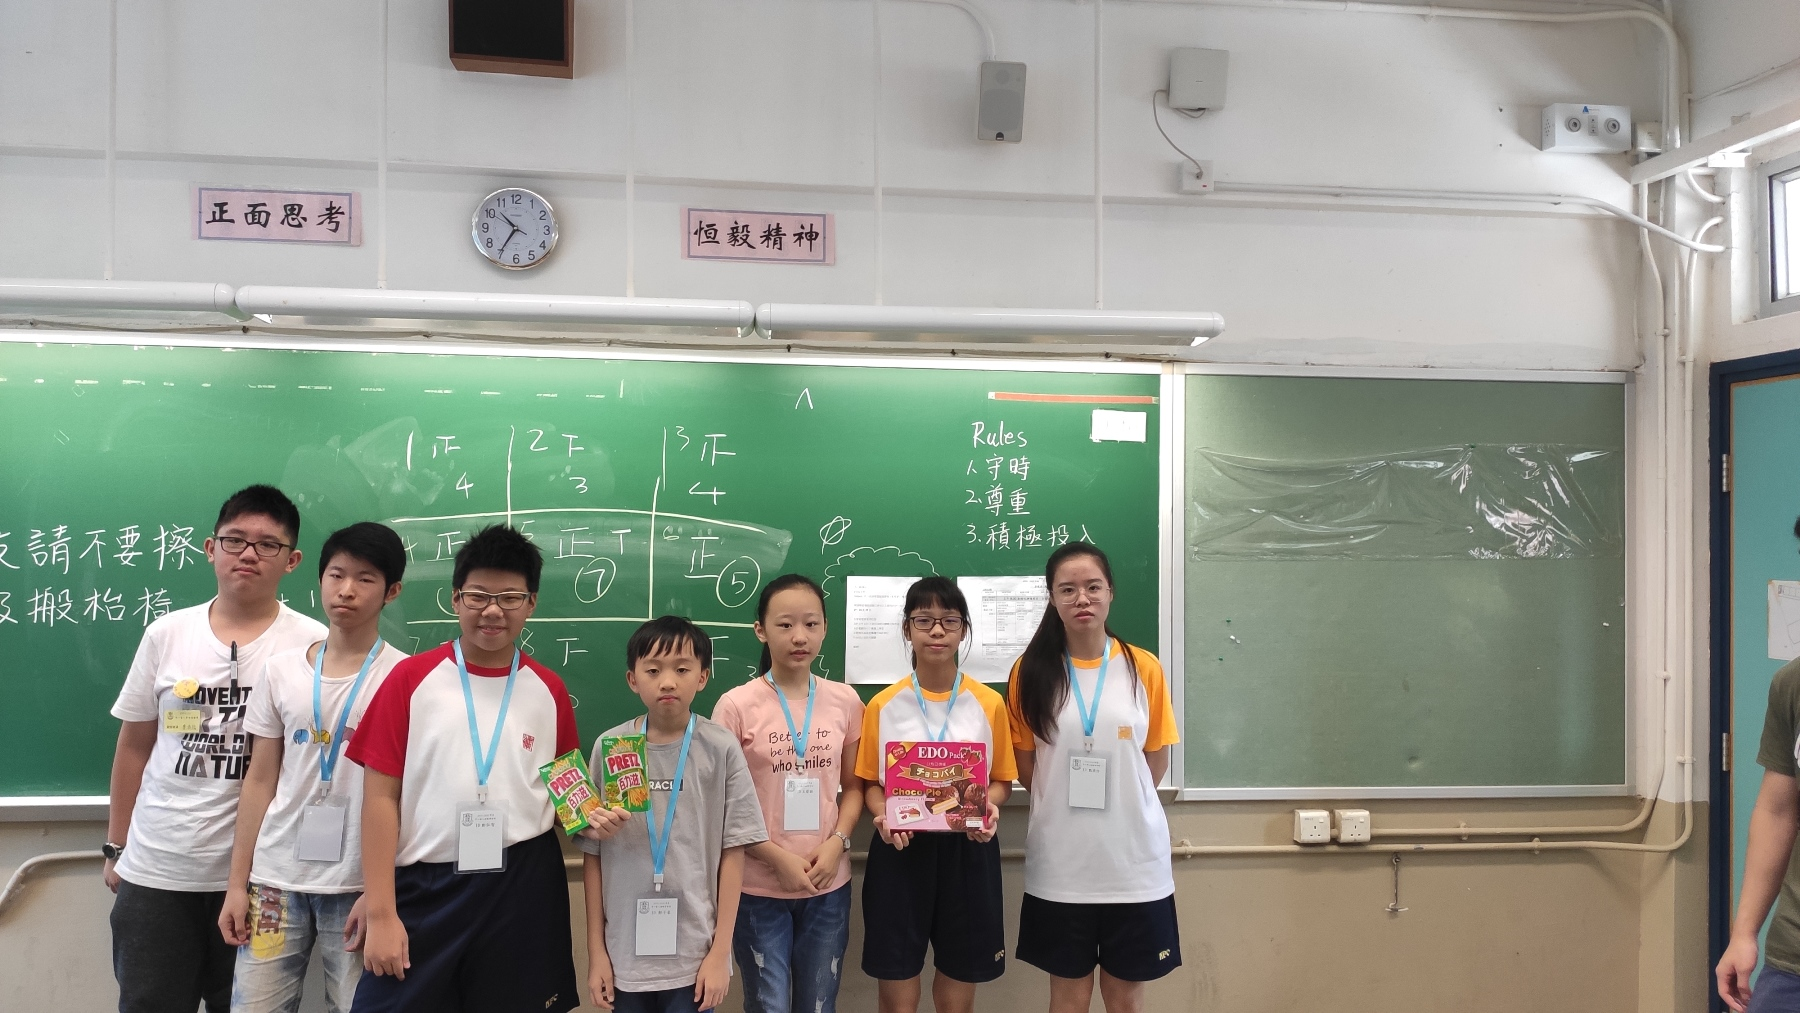 http://npc.edu.hk/sites/default/files/img_20190816_103605.jpg